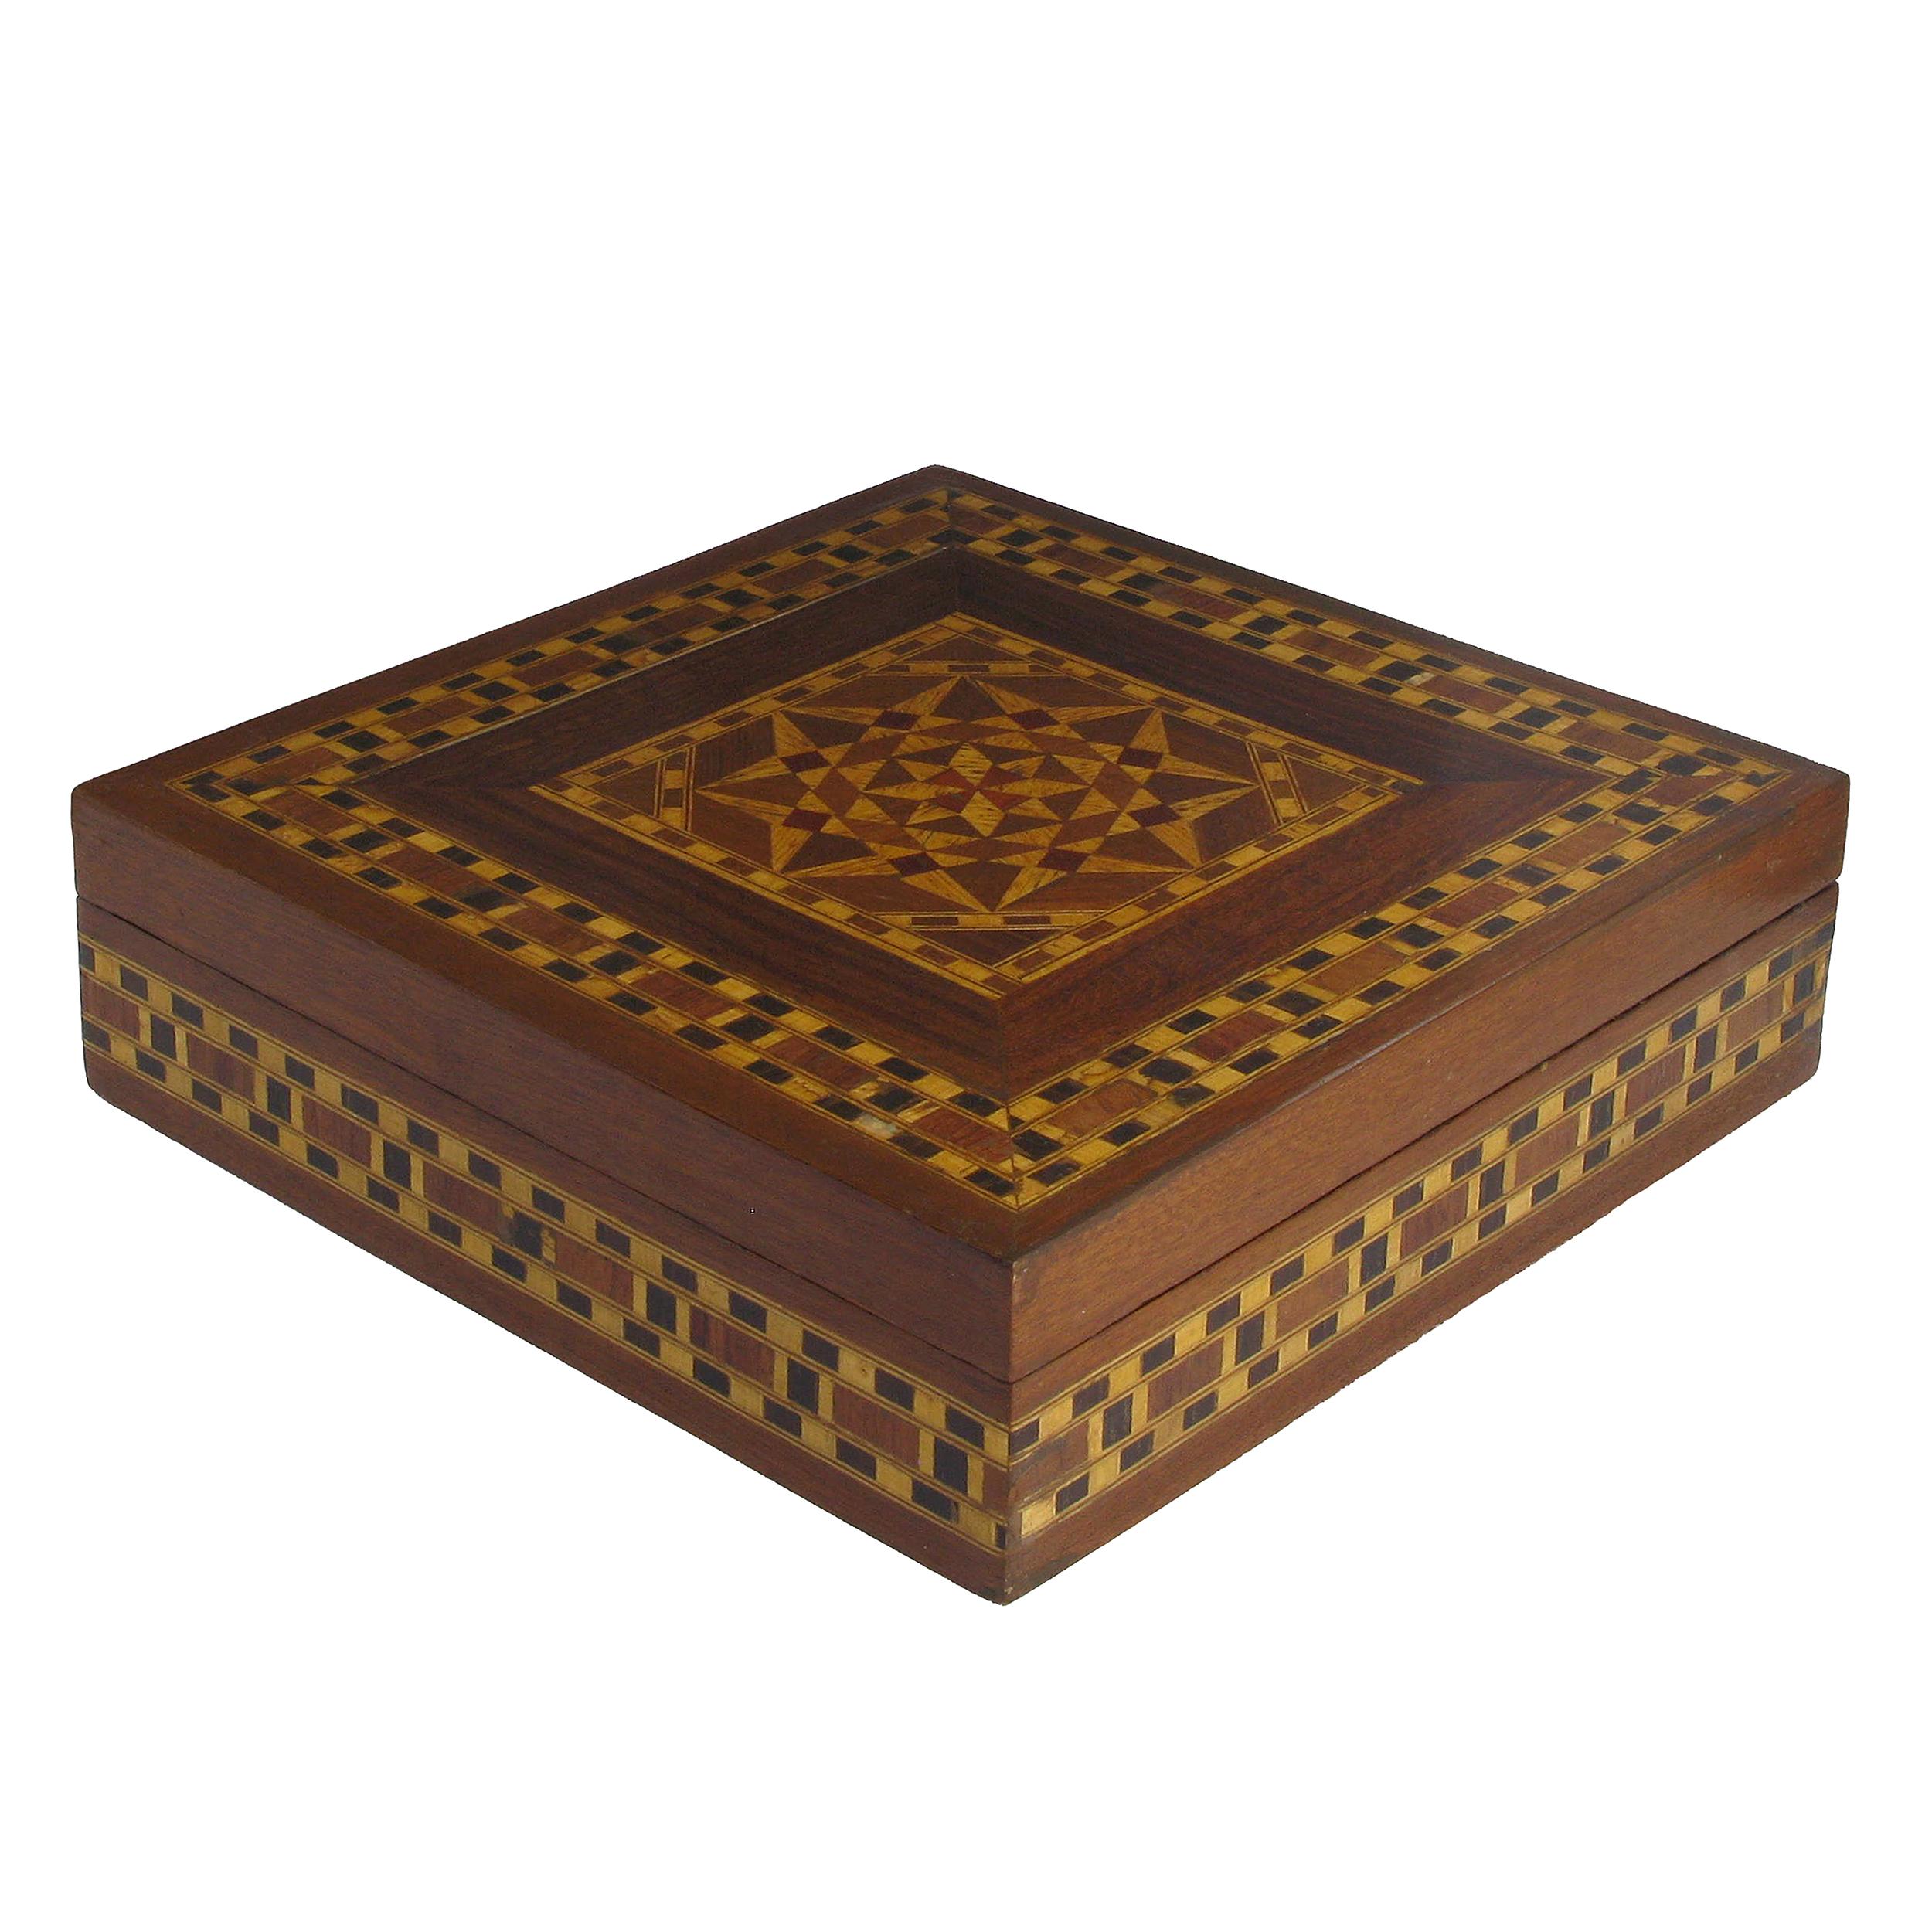 Syrian Wooden Box (20cm)